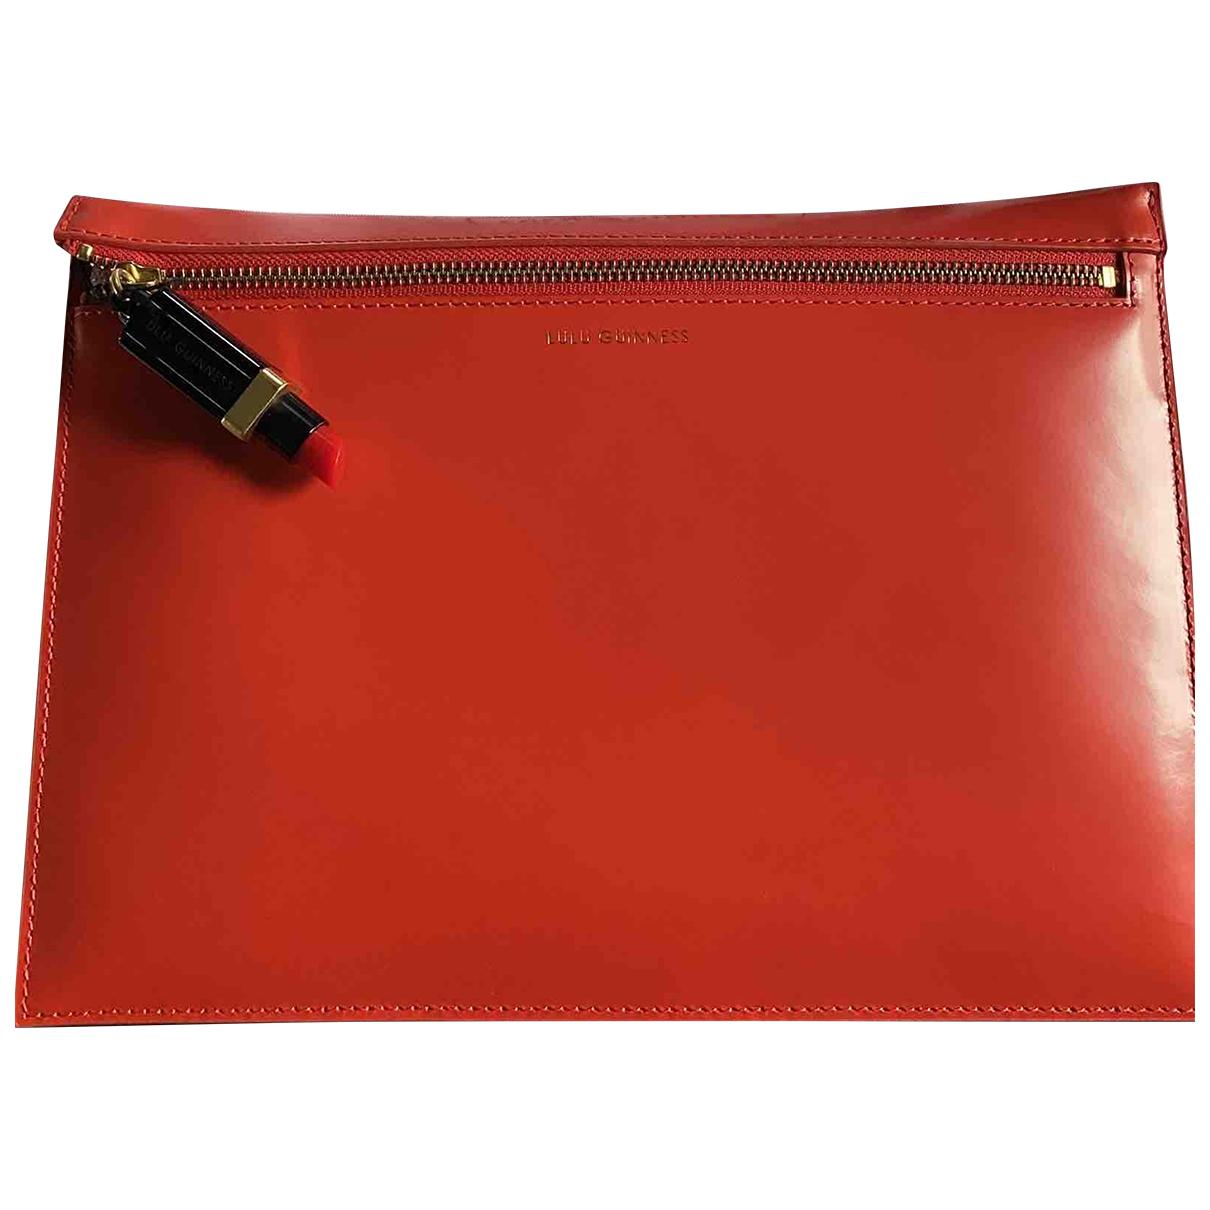 Lulu Guinness \N Clutch in  Rot Leder